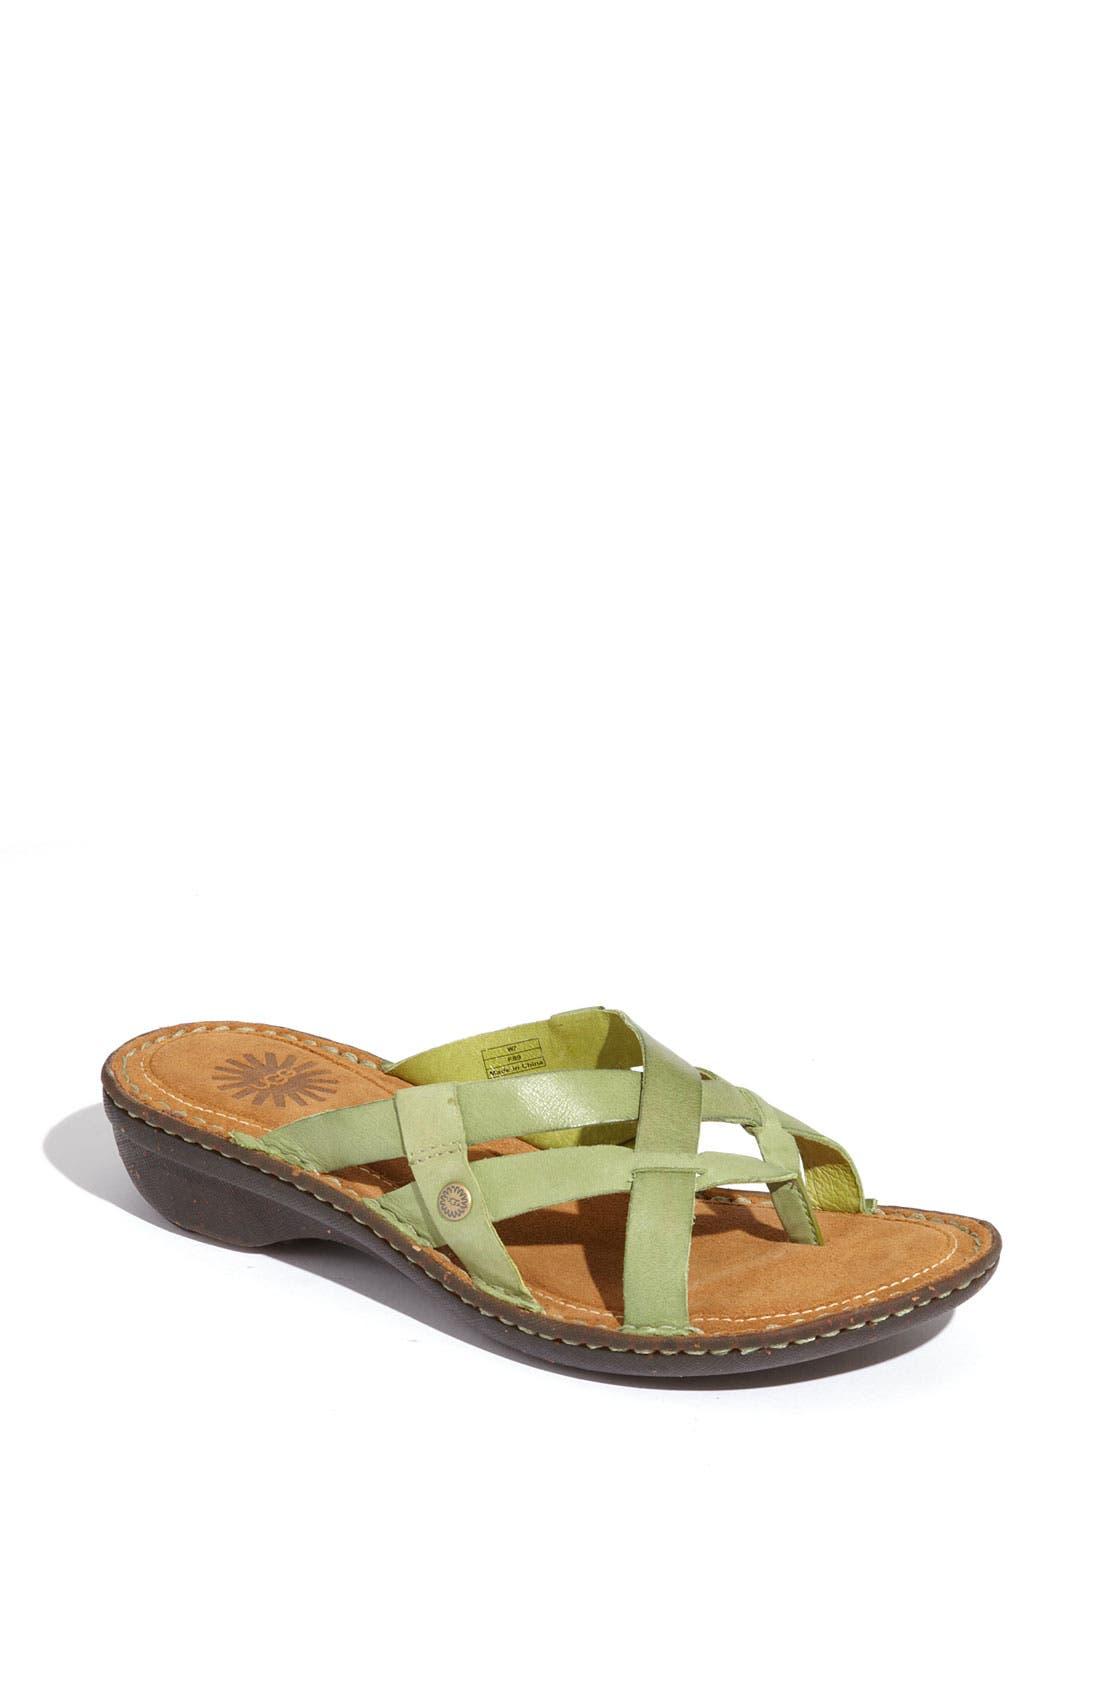 Alternate Image 1 Selected - UGG® Australia 'Lanni' Sandal